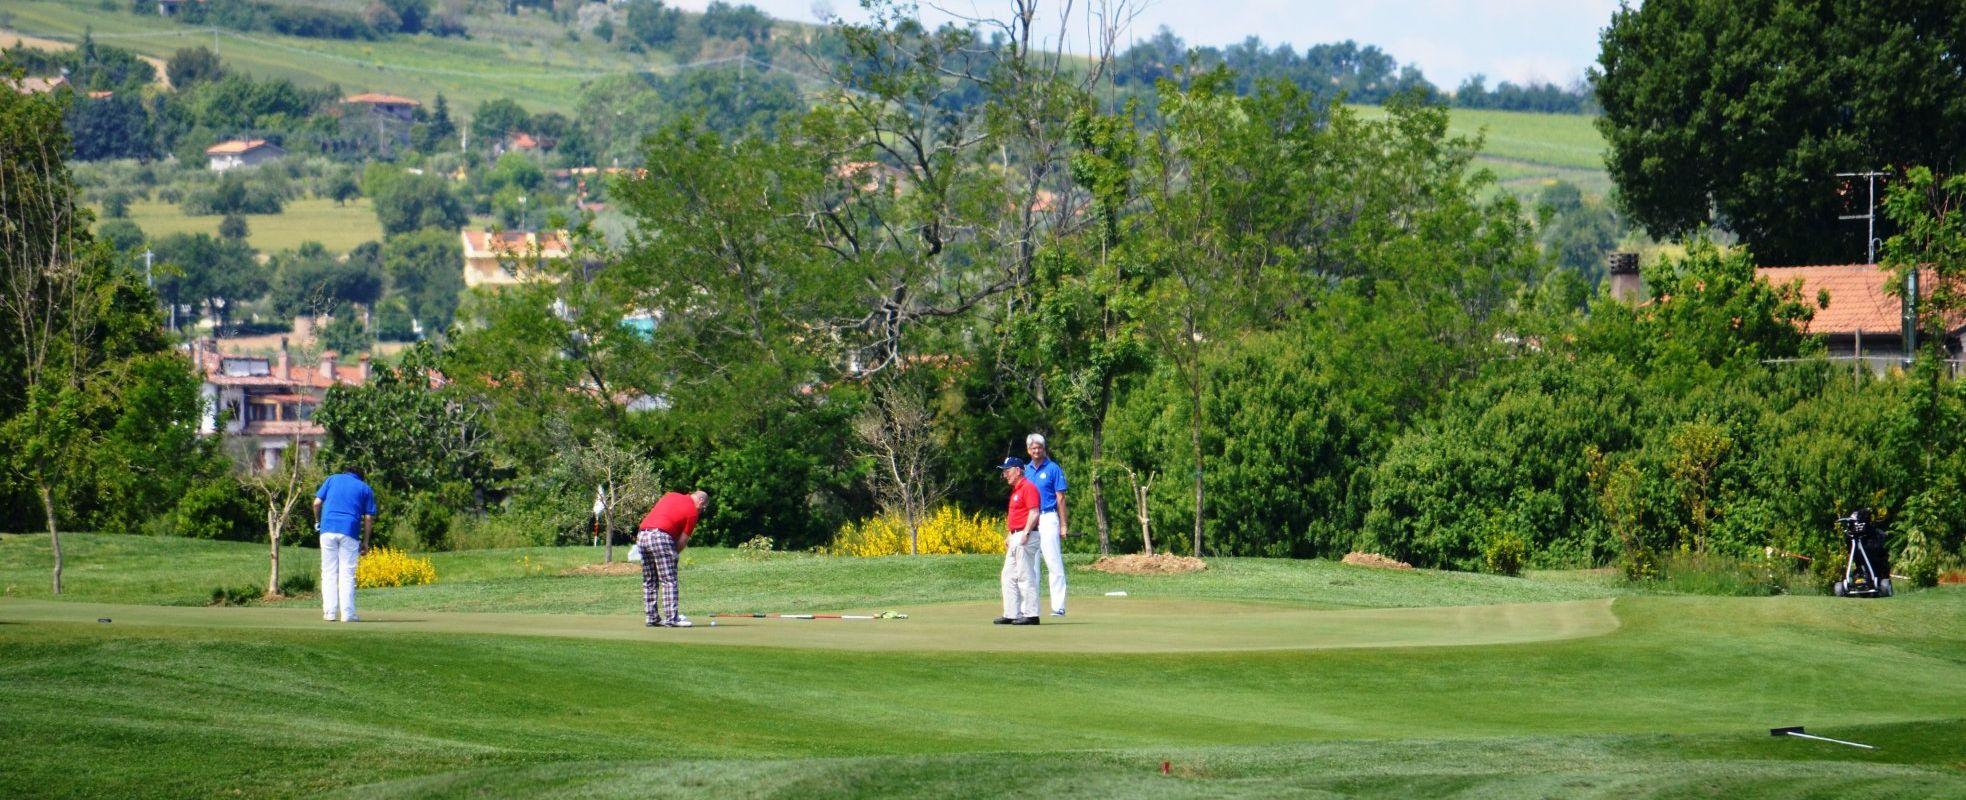 golf-san-giovanni-marignano